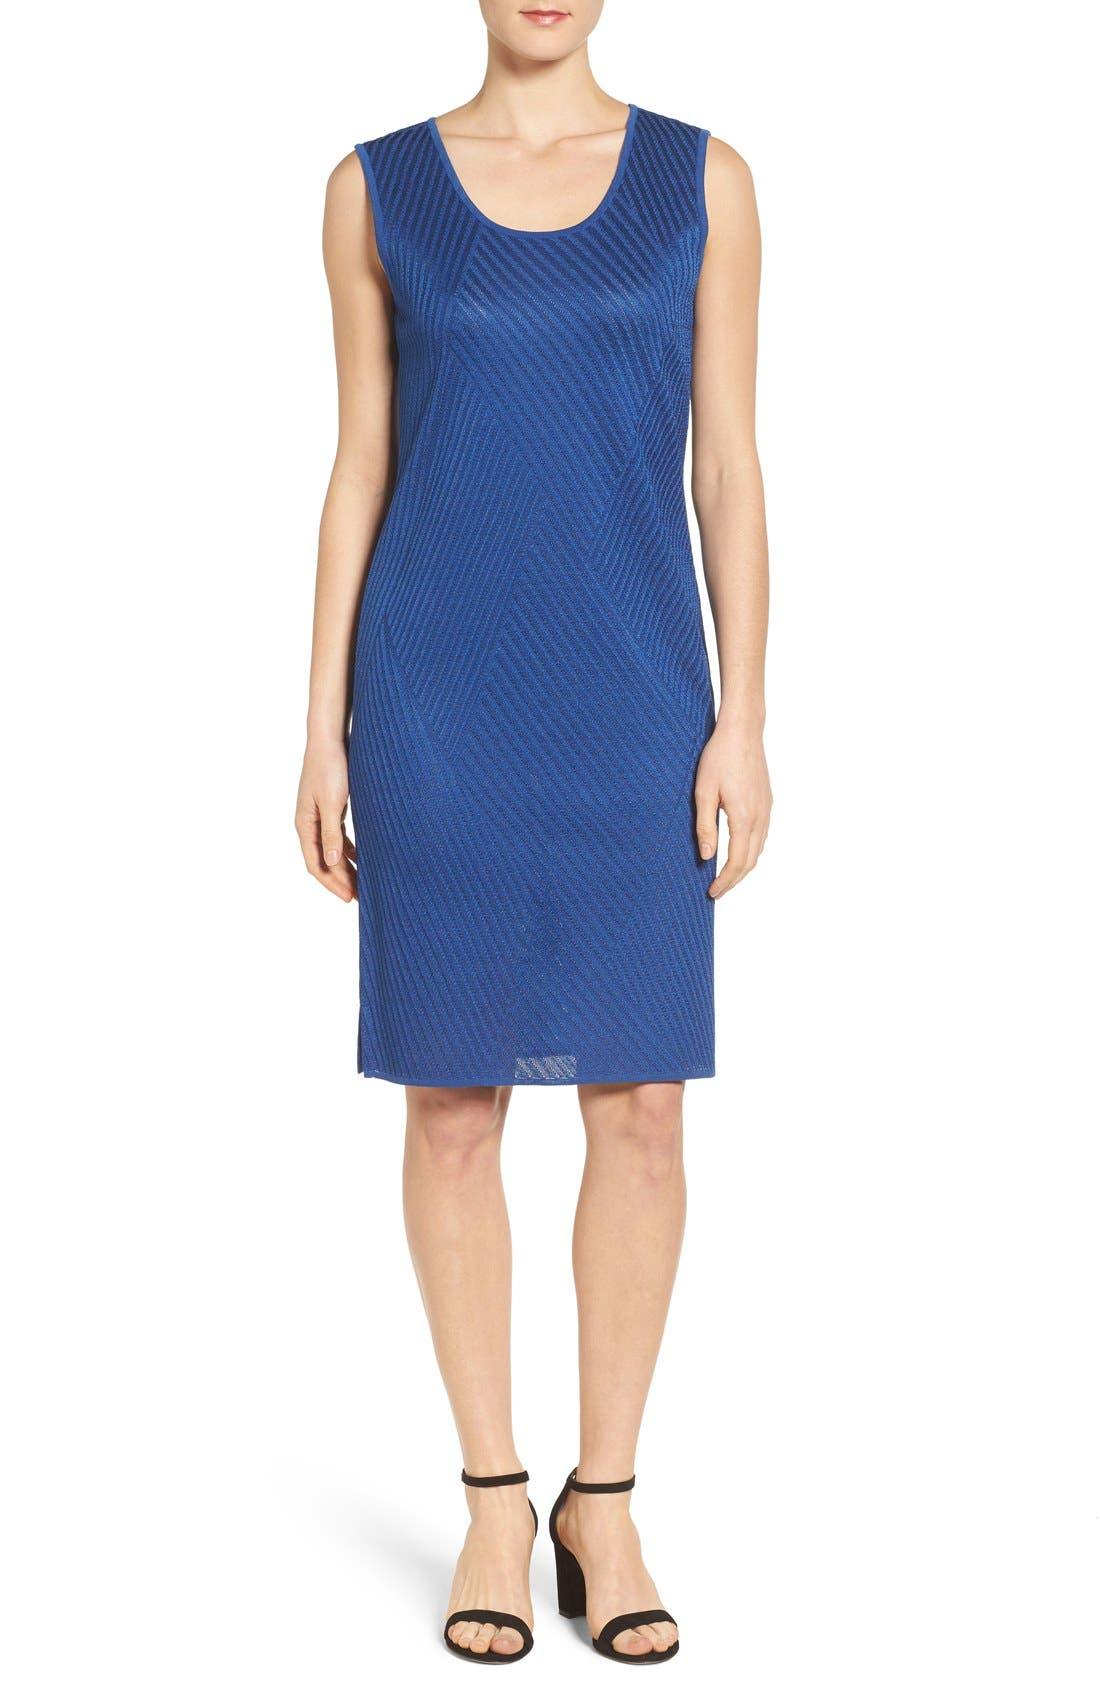 Alternate Image 1 Selected - Ming Wang Texture Knit Sheath Dress